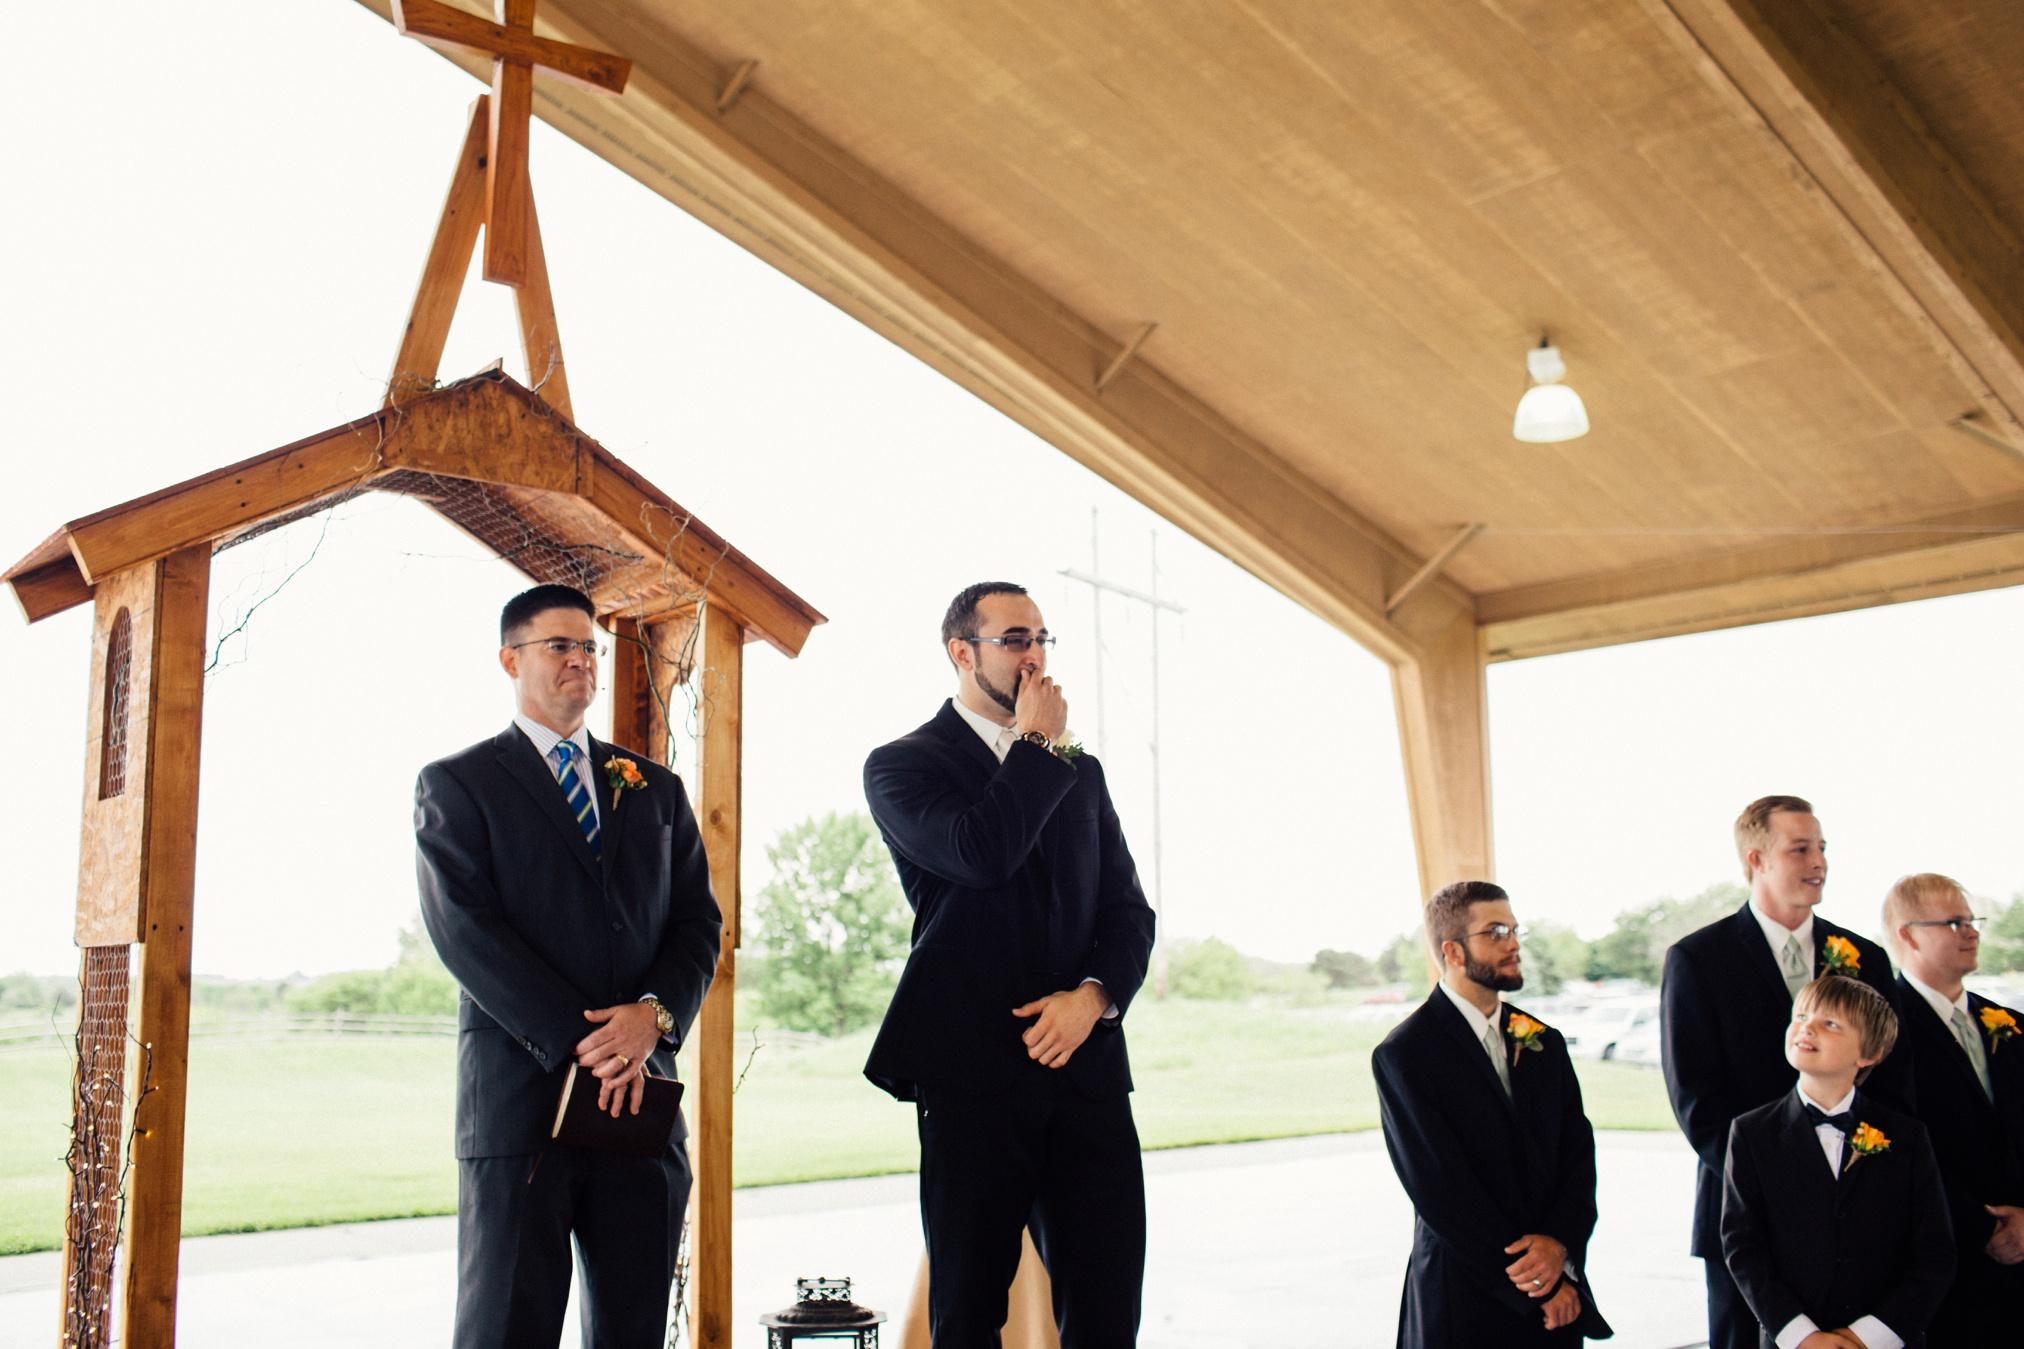 schmid_wedding-374.jpg